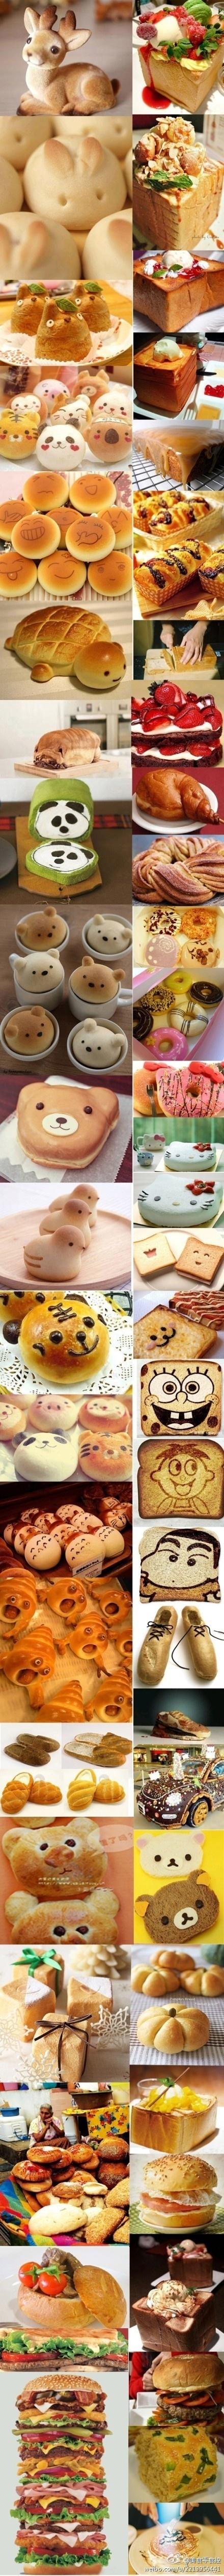 cute bread